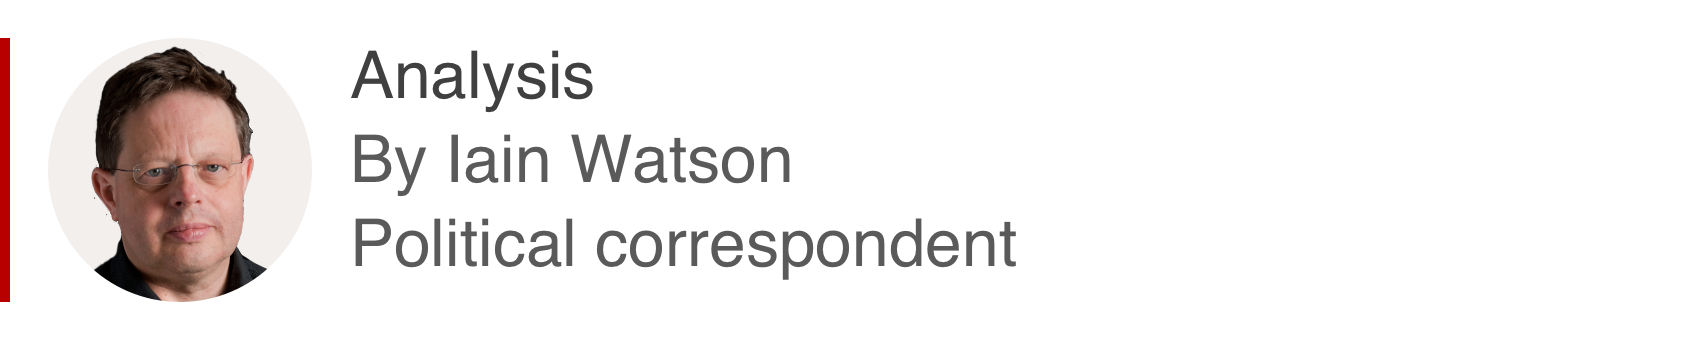 Analysis box by Iain Watson, political correspondent